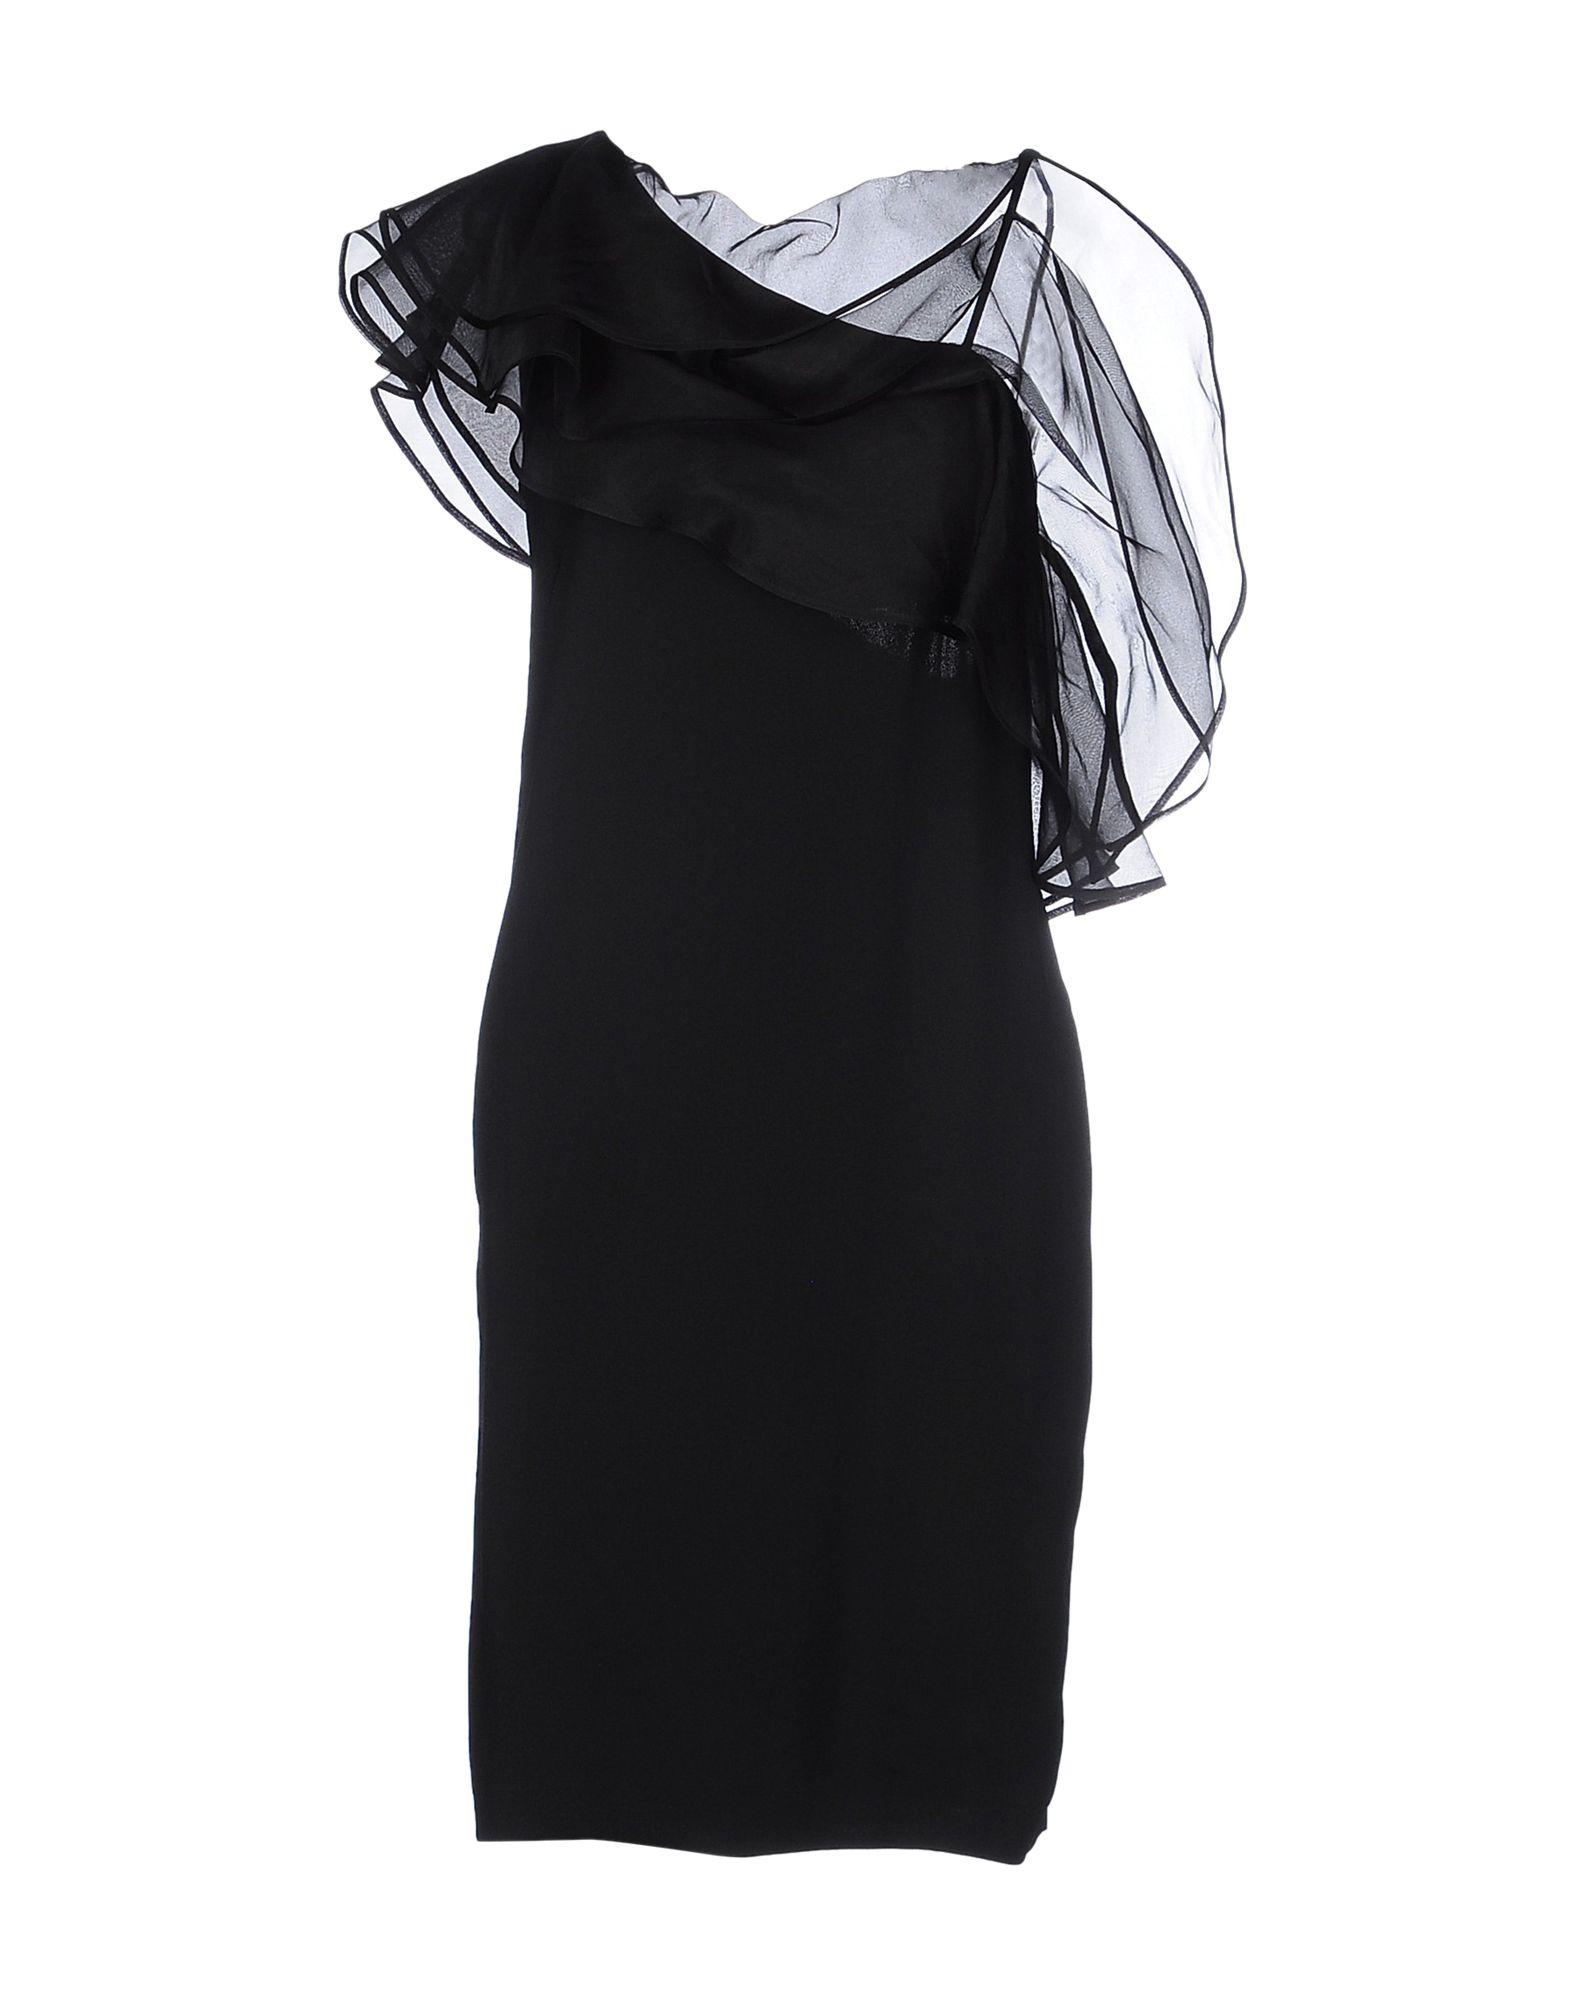 Space Style Concept Short Dress   Women Space Style Concept Short Dresses   34576425